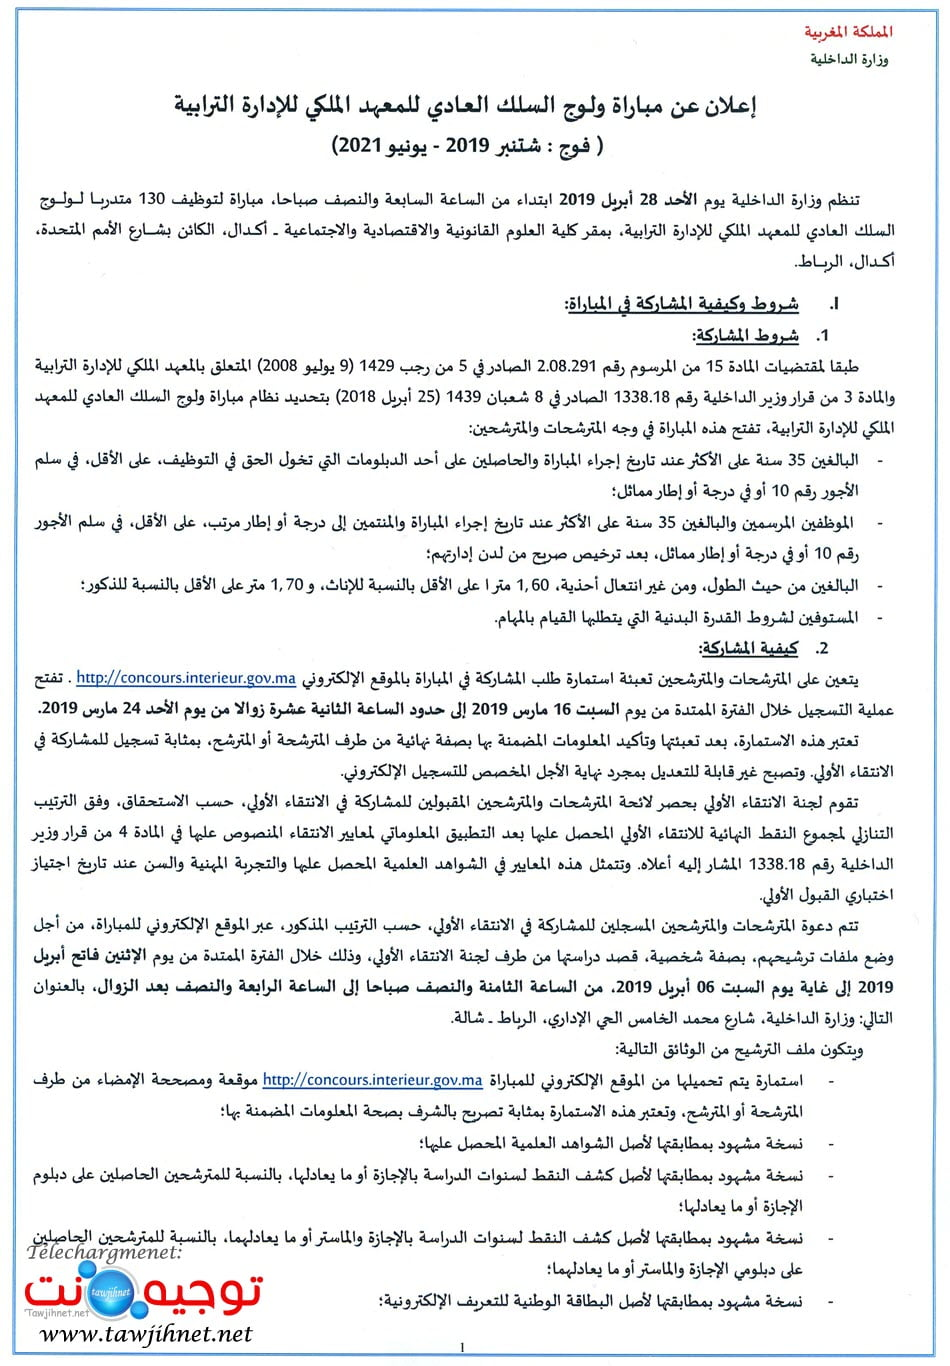 IRAT Rabat مباراة توظيف 130 قائد متدرب من أجل ولوج السلك العادي للمعهد الملكي للإدارة  الترابية 2019